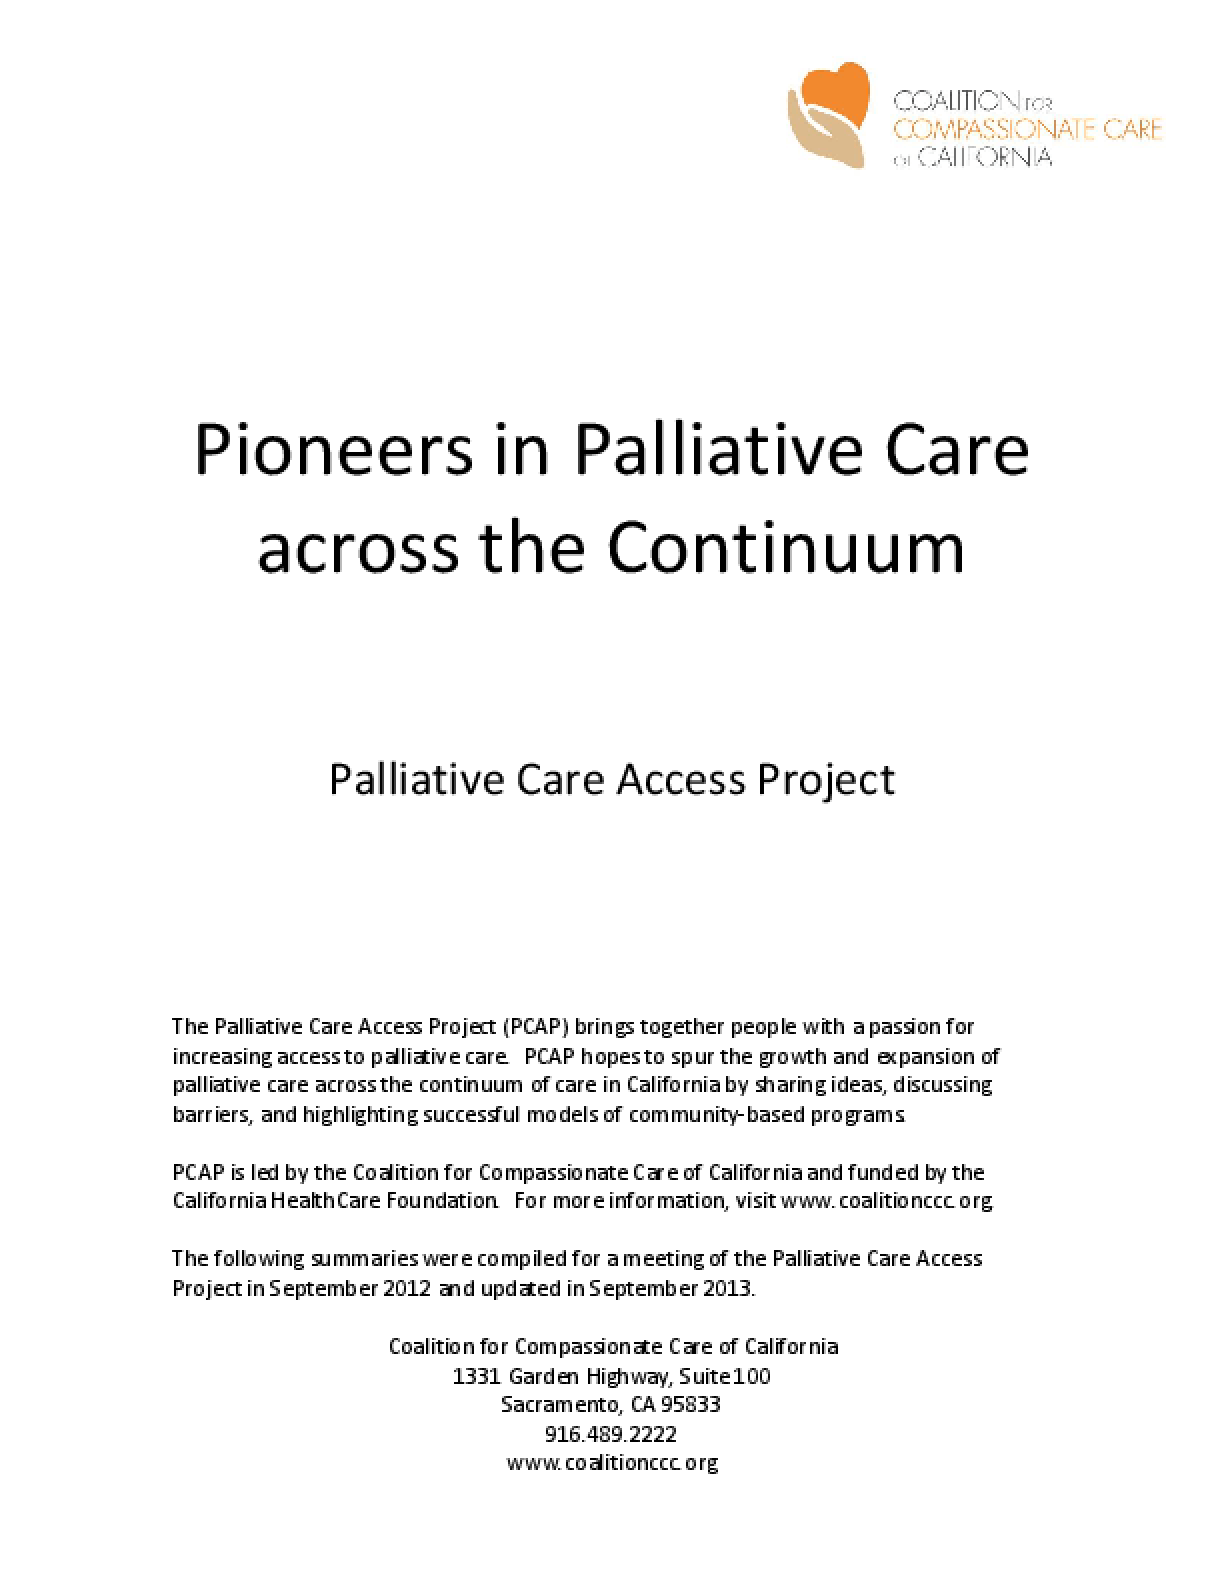 Pioneers in Palliative Care across the Continuum